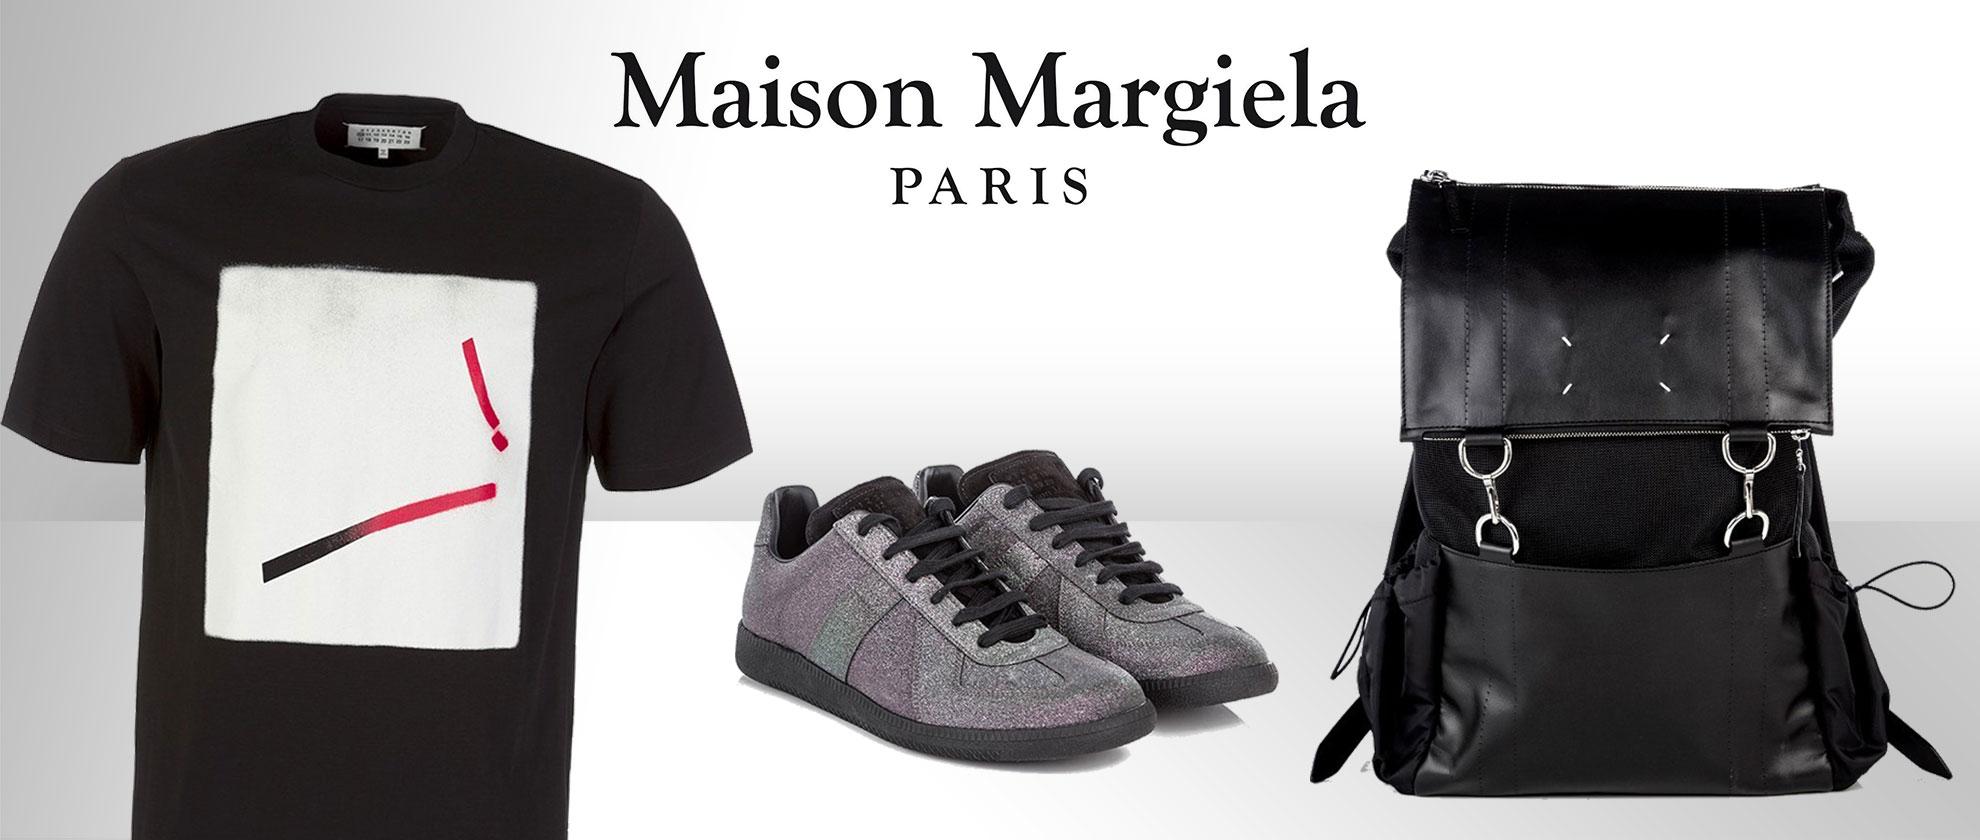 Brand Spotlight: Maison Margiela